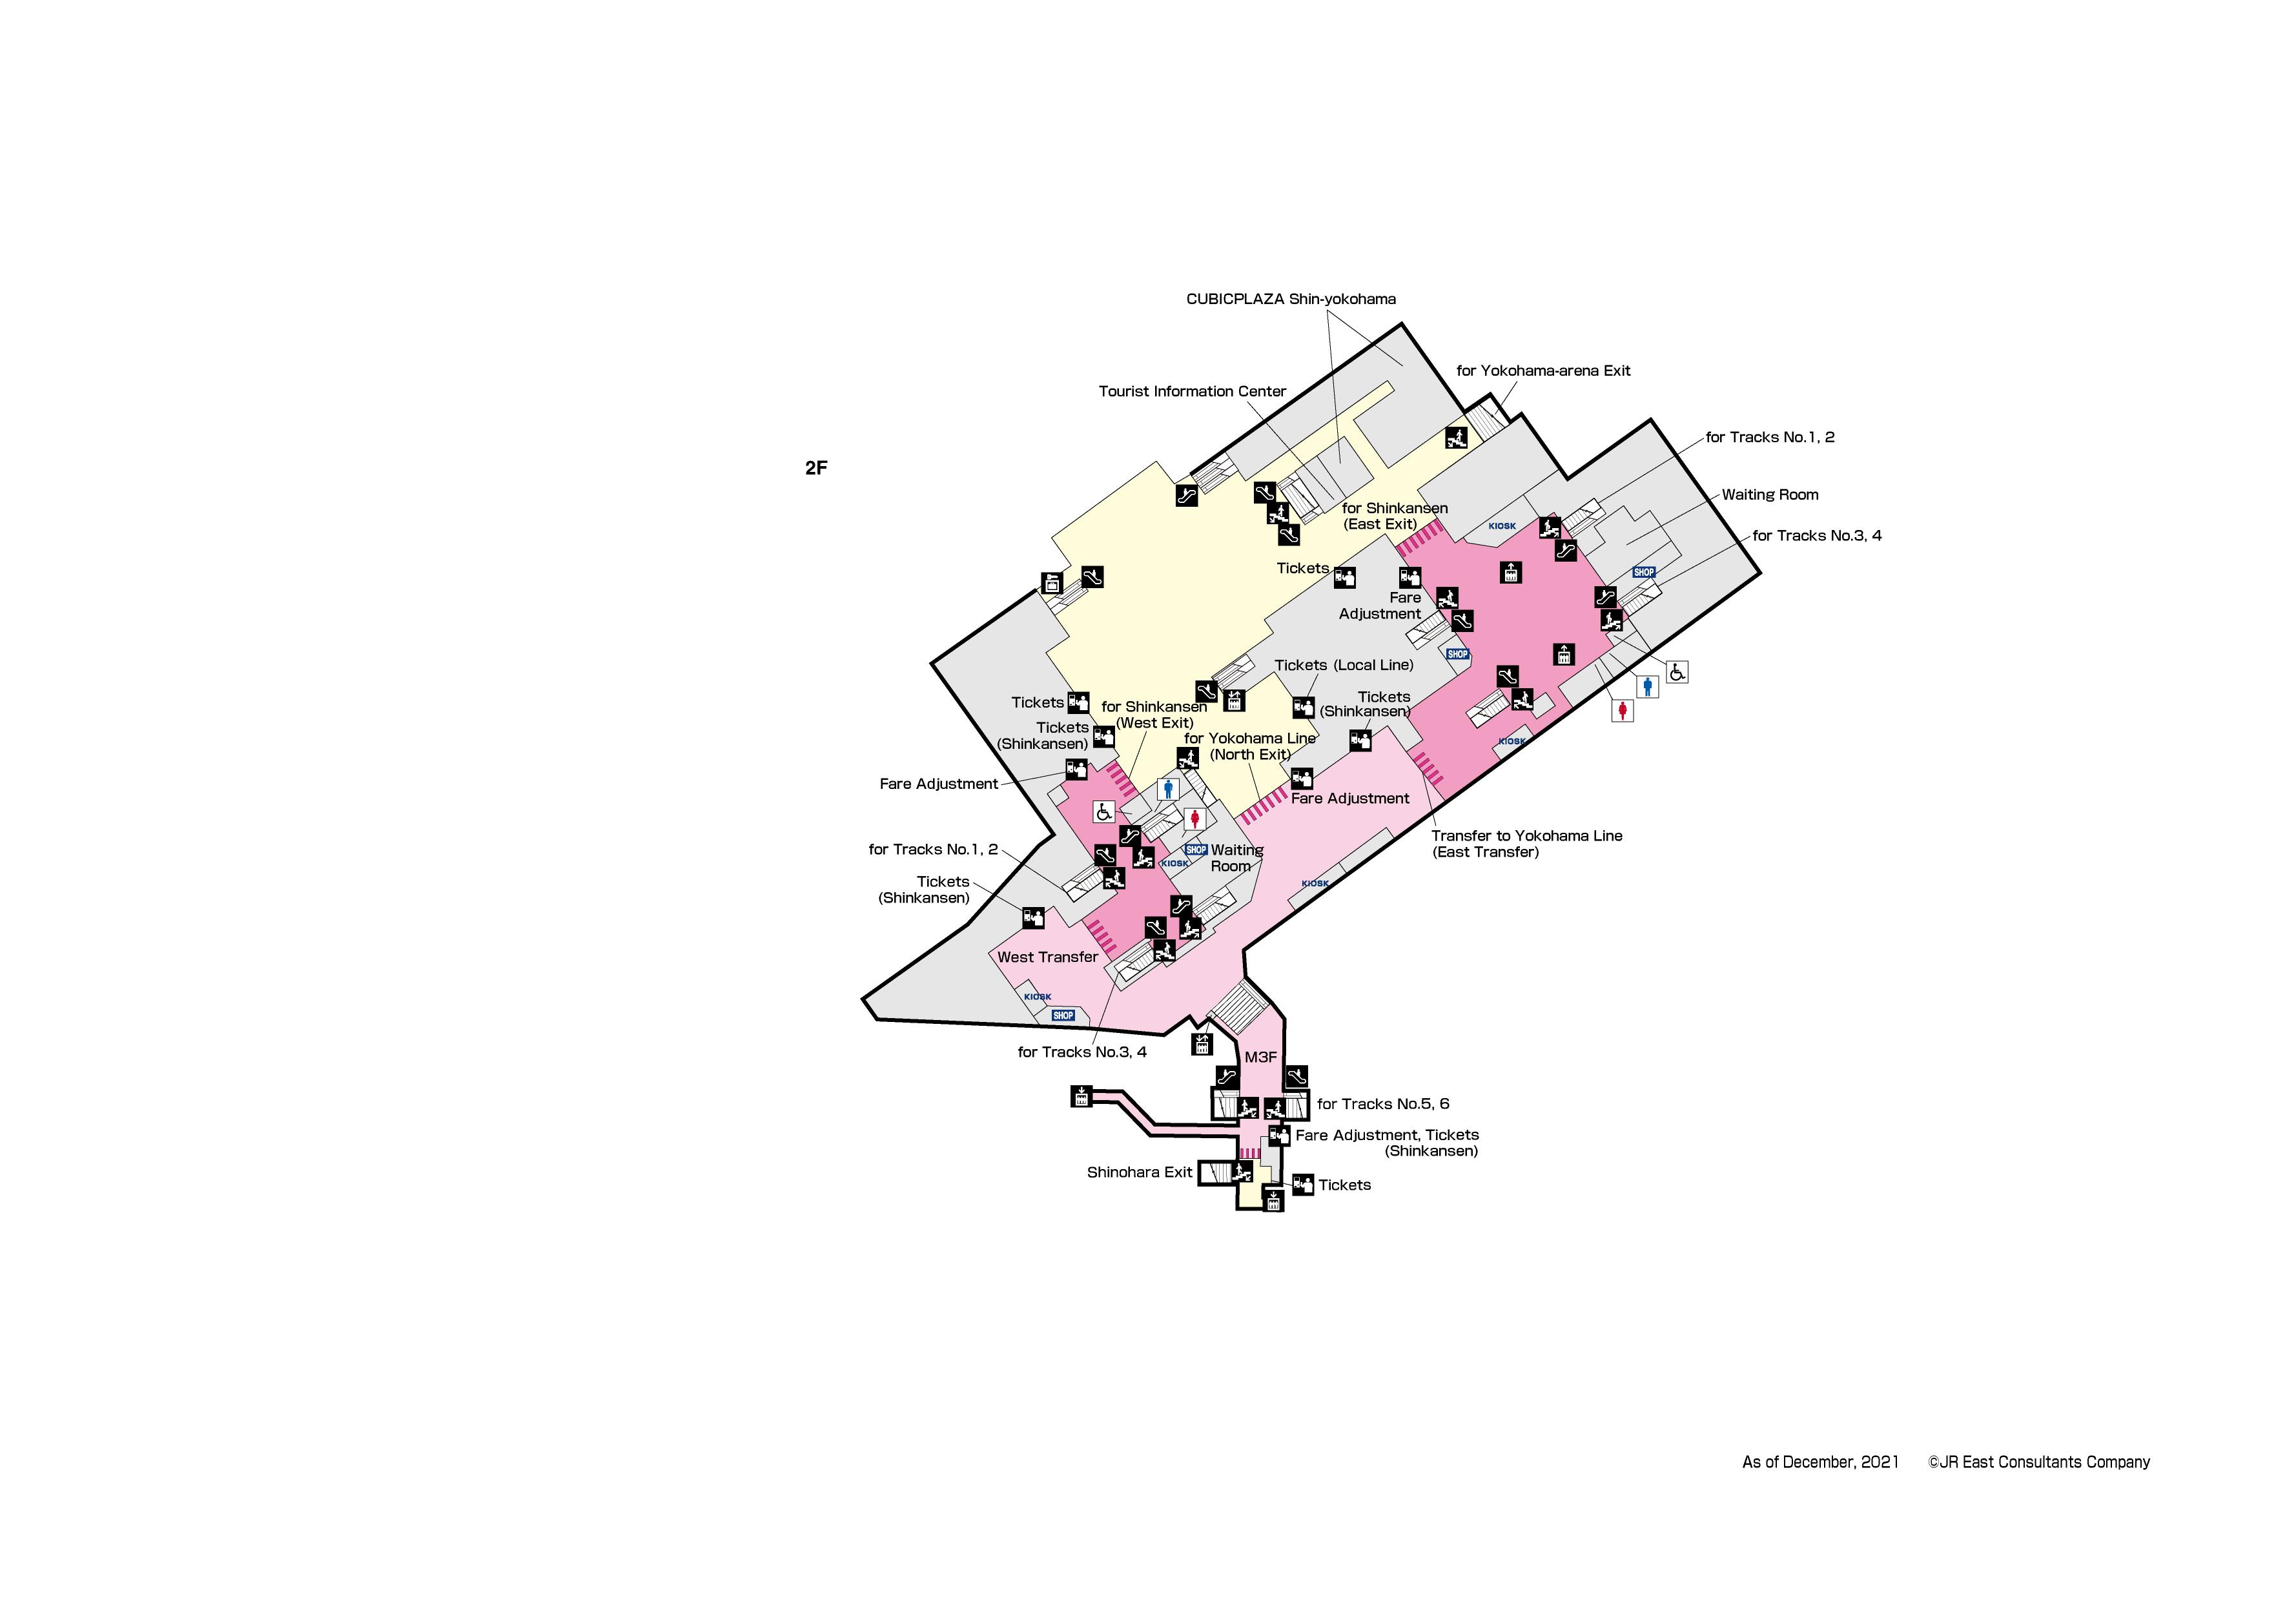 JR-EAST:Guide Maps for Major Stations (Shin-Yokohama Station) on osaka japan, tokyo japan, kagoshima japan, skyline at night japan, kawasaki japan, yokohama japan, kyoto japan, omiya japan, kanagawa japan, visit japan, yokosuka japan, entrance way japan, hiratsuka japan, map of japan,